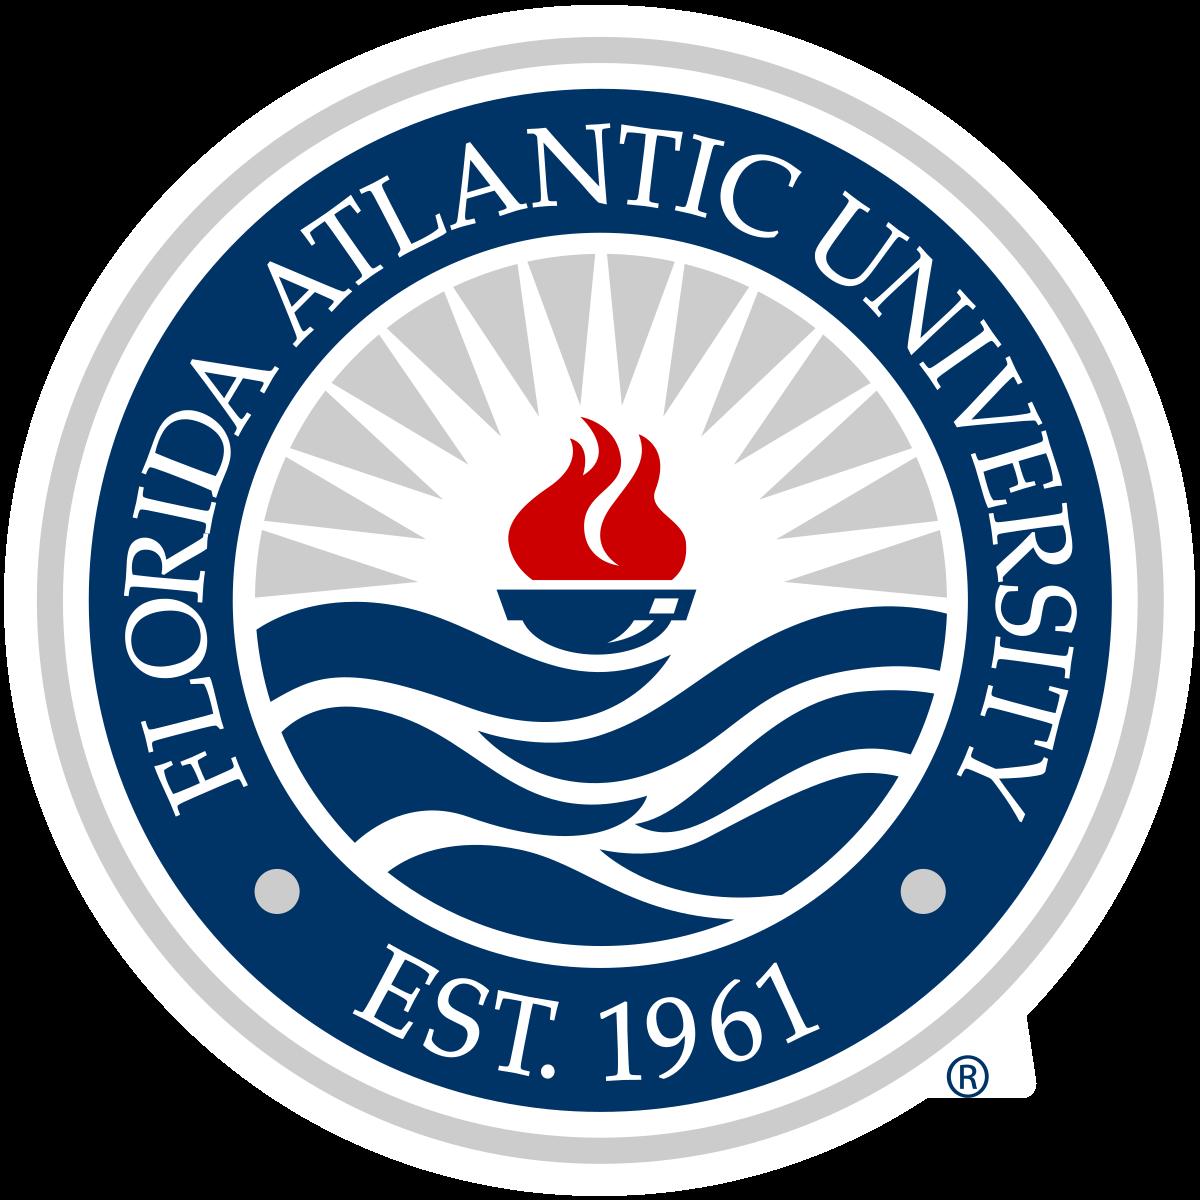 FAU - Florida Atlantic University